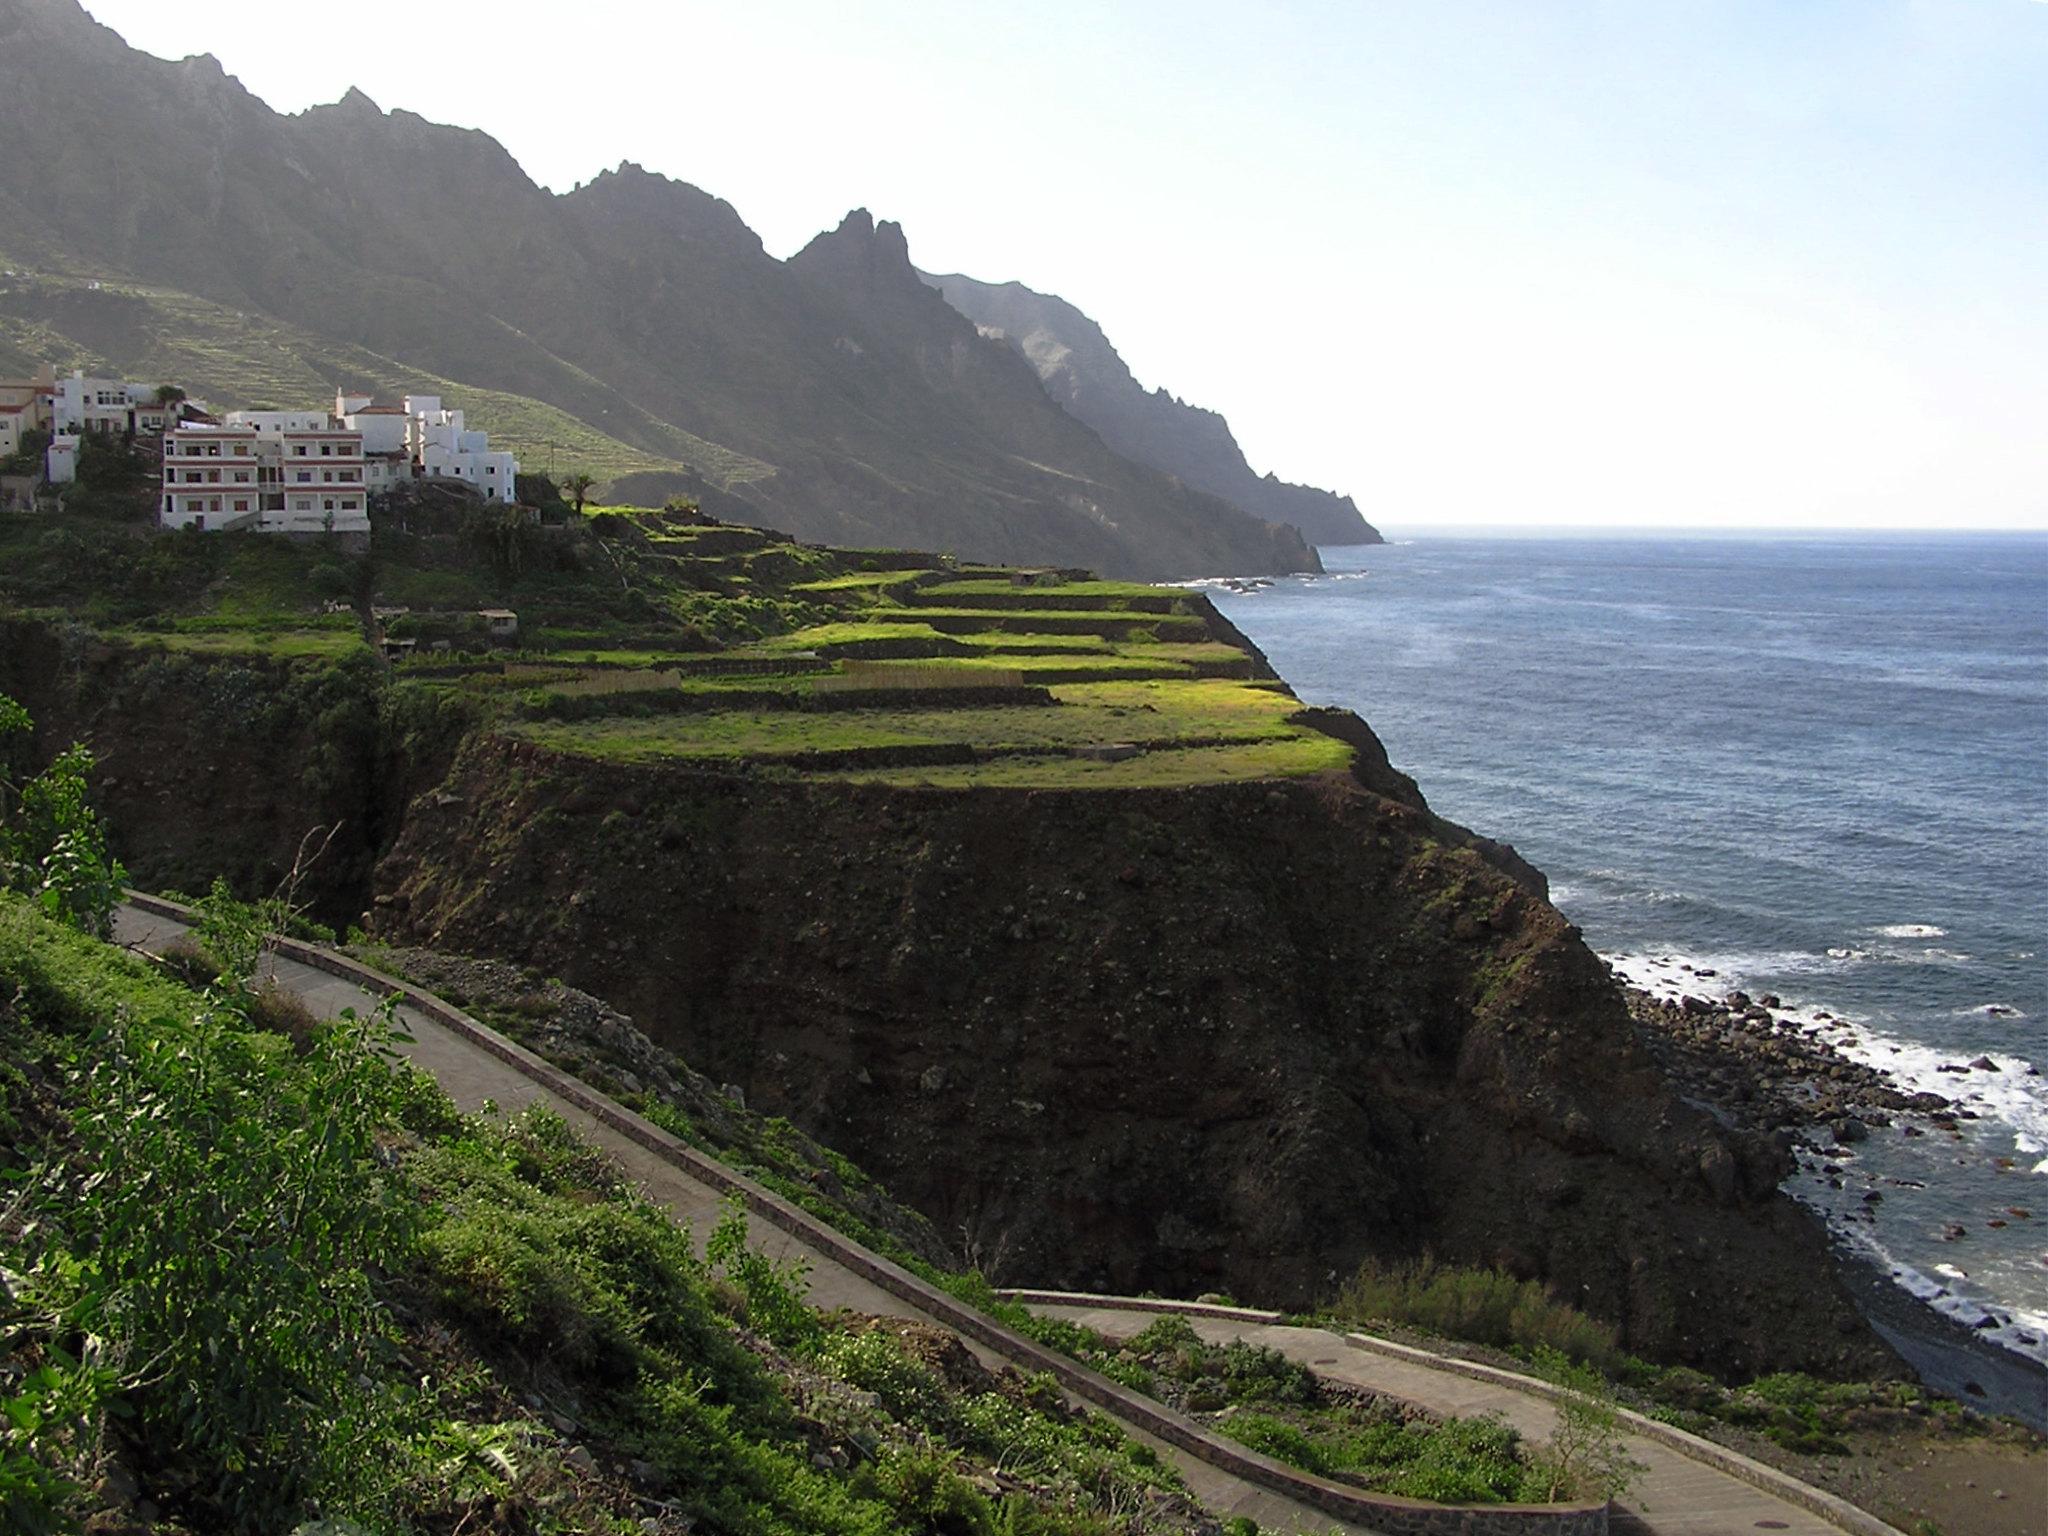 costa de Taganana isla de Tenerife